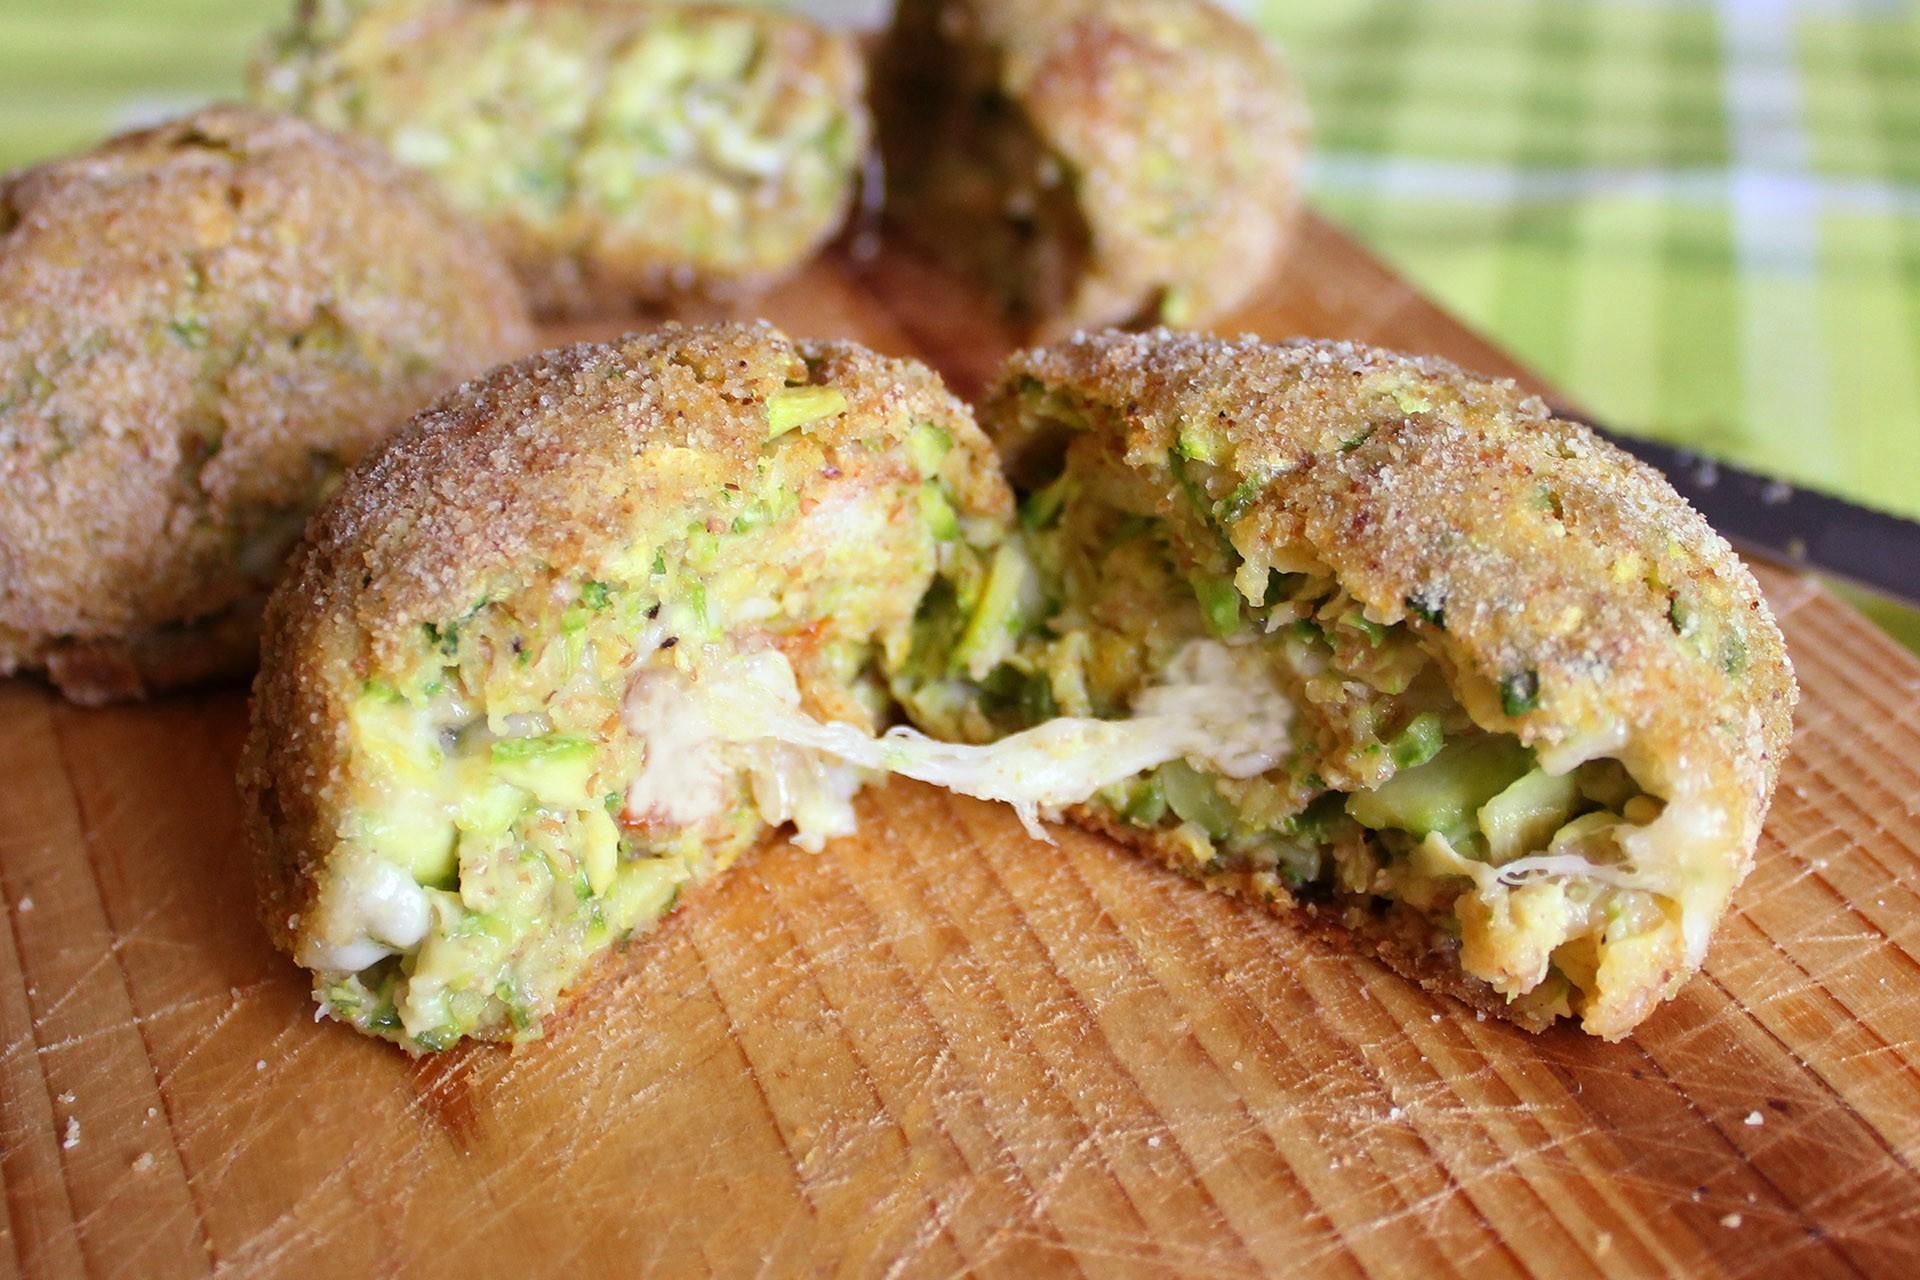 Ricetta polpette di pane e zucchine cucina vegetariana - Cucina vegetariana ricette ...